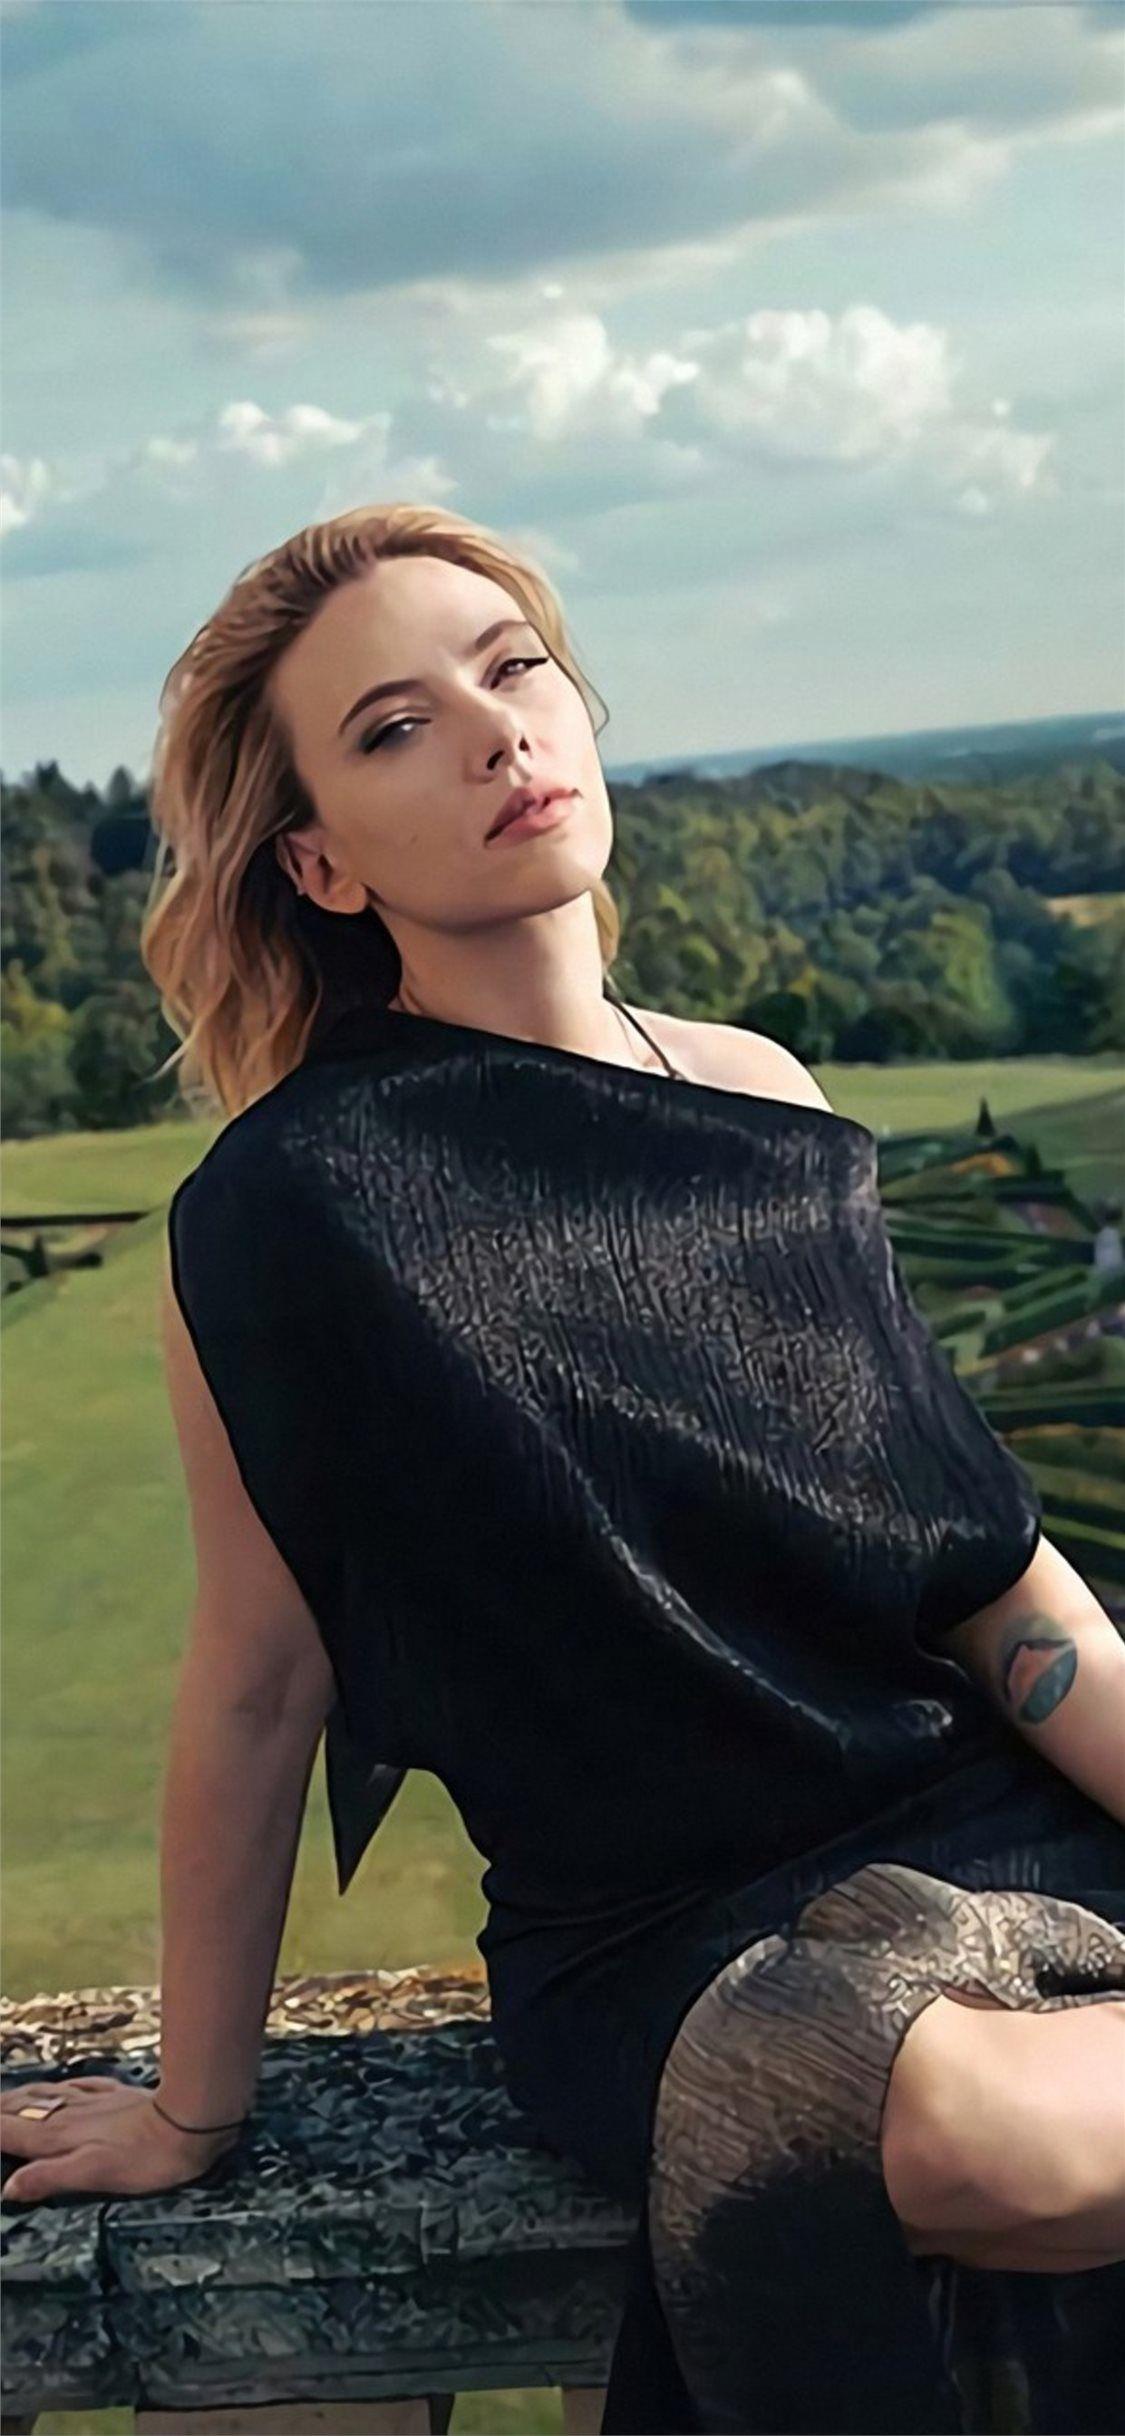 Scarlett Johansson Scarlett Johansson The Hollywood Reporter